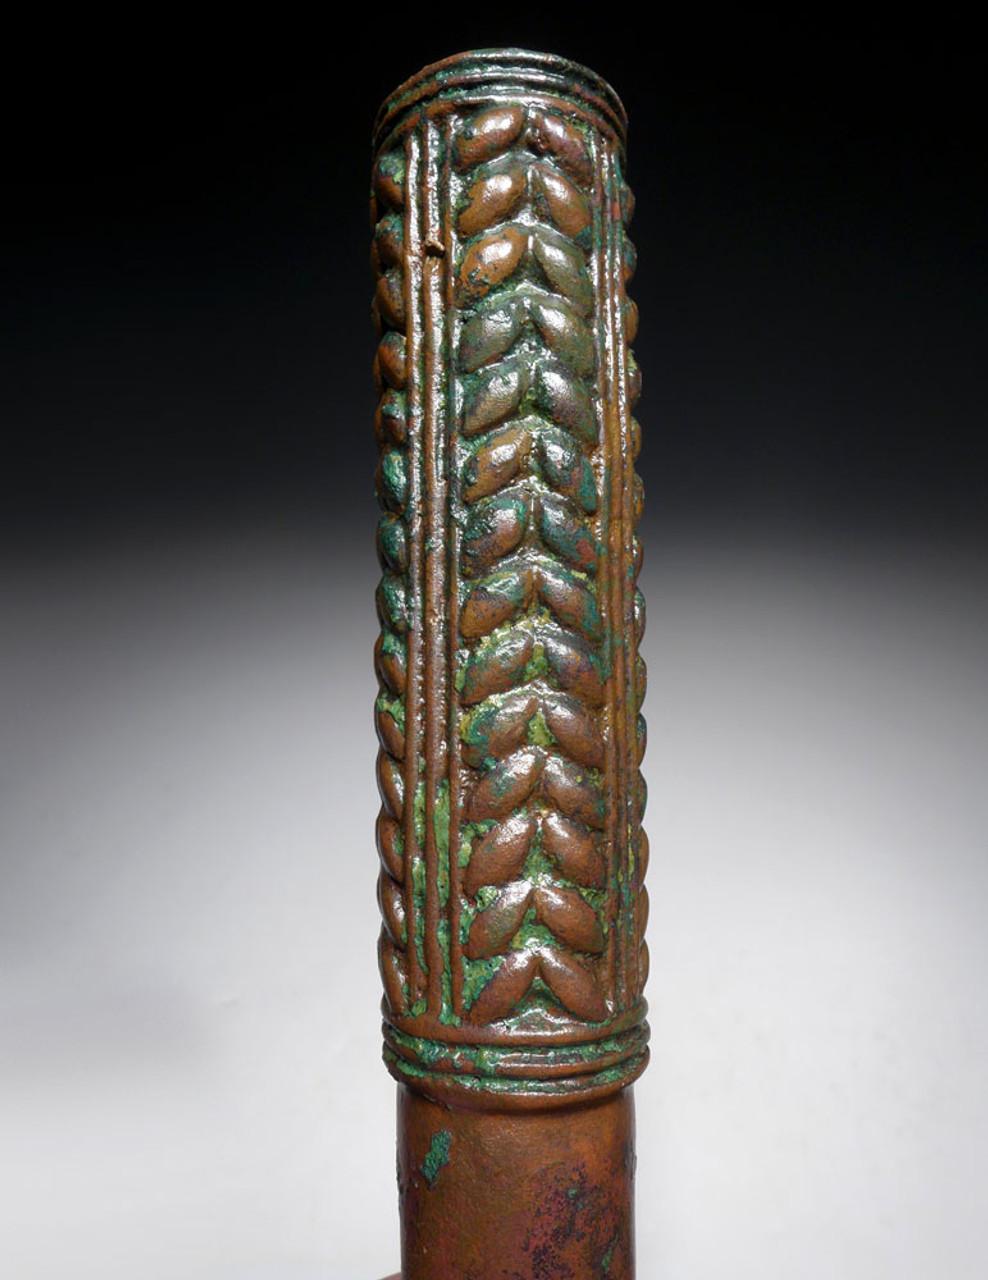 FINEST ANCIENT BRONZE LURISTAN WAR MACE CUDGEL WITH HERRINGBONE DESIGN  *LUR175